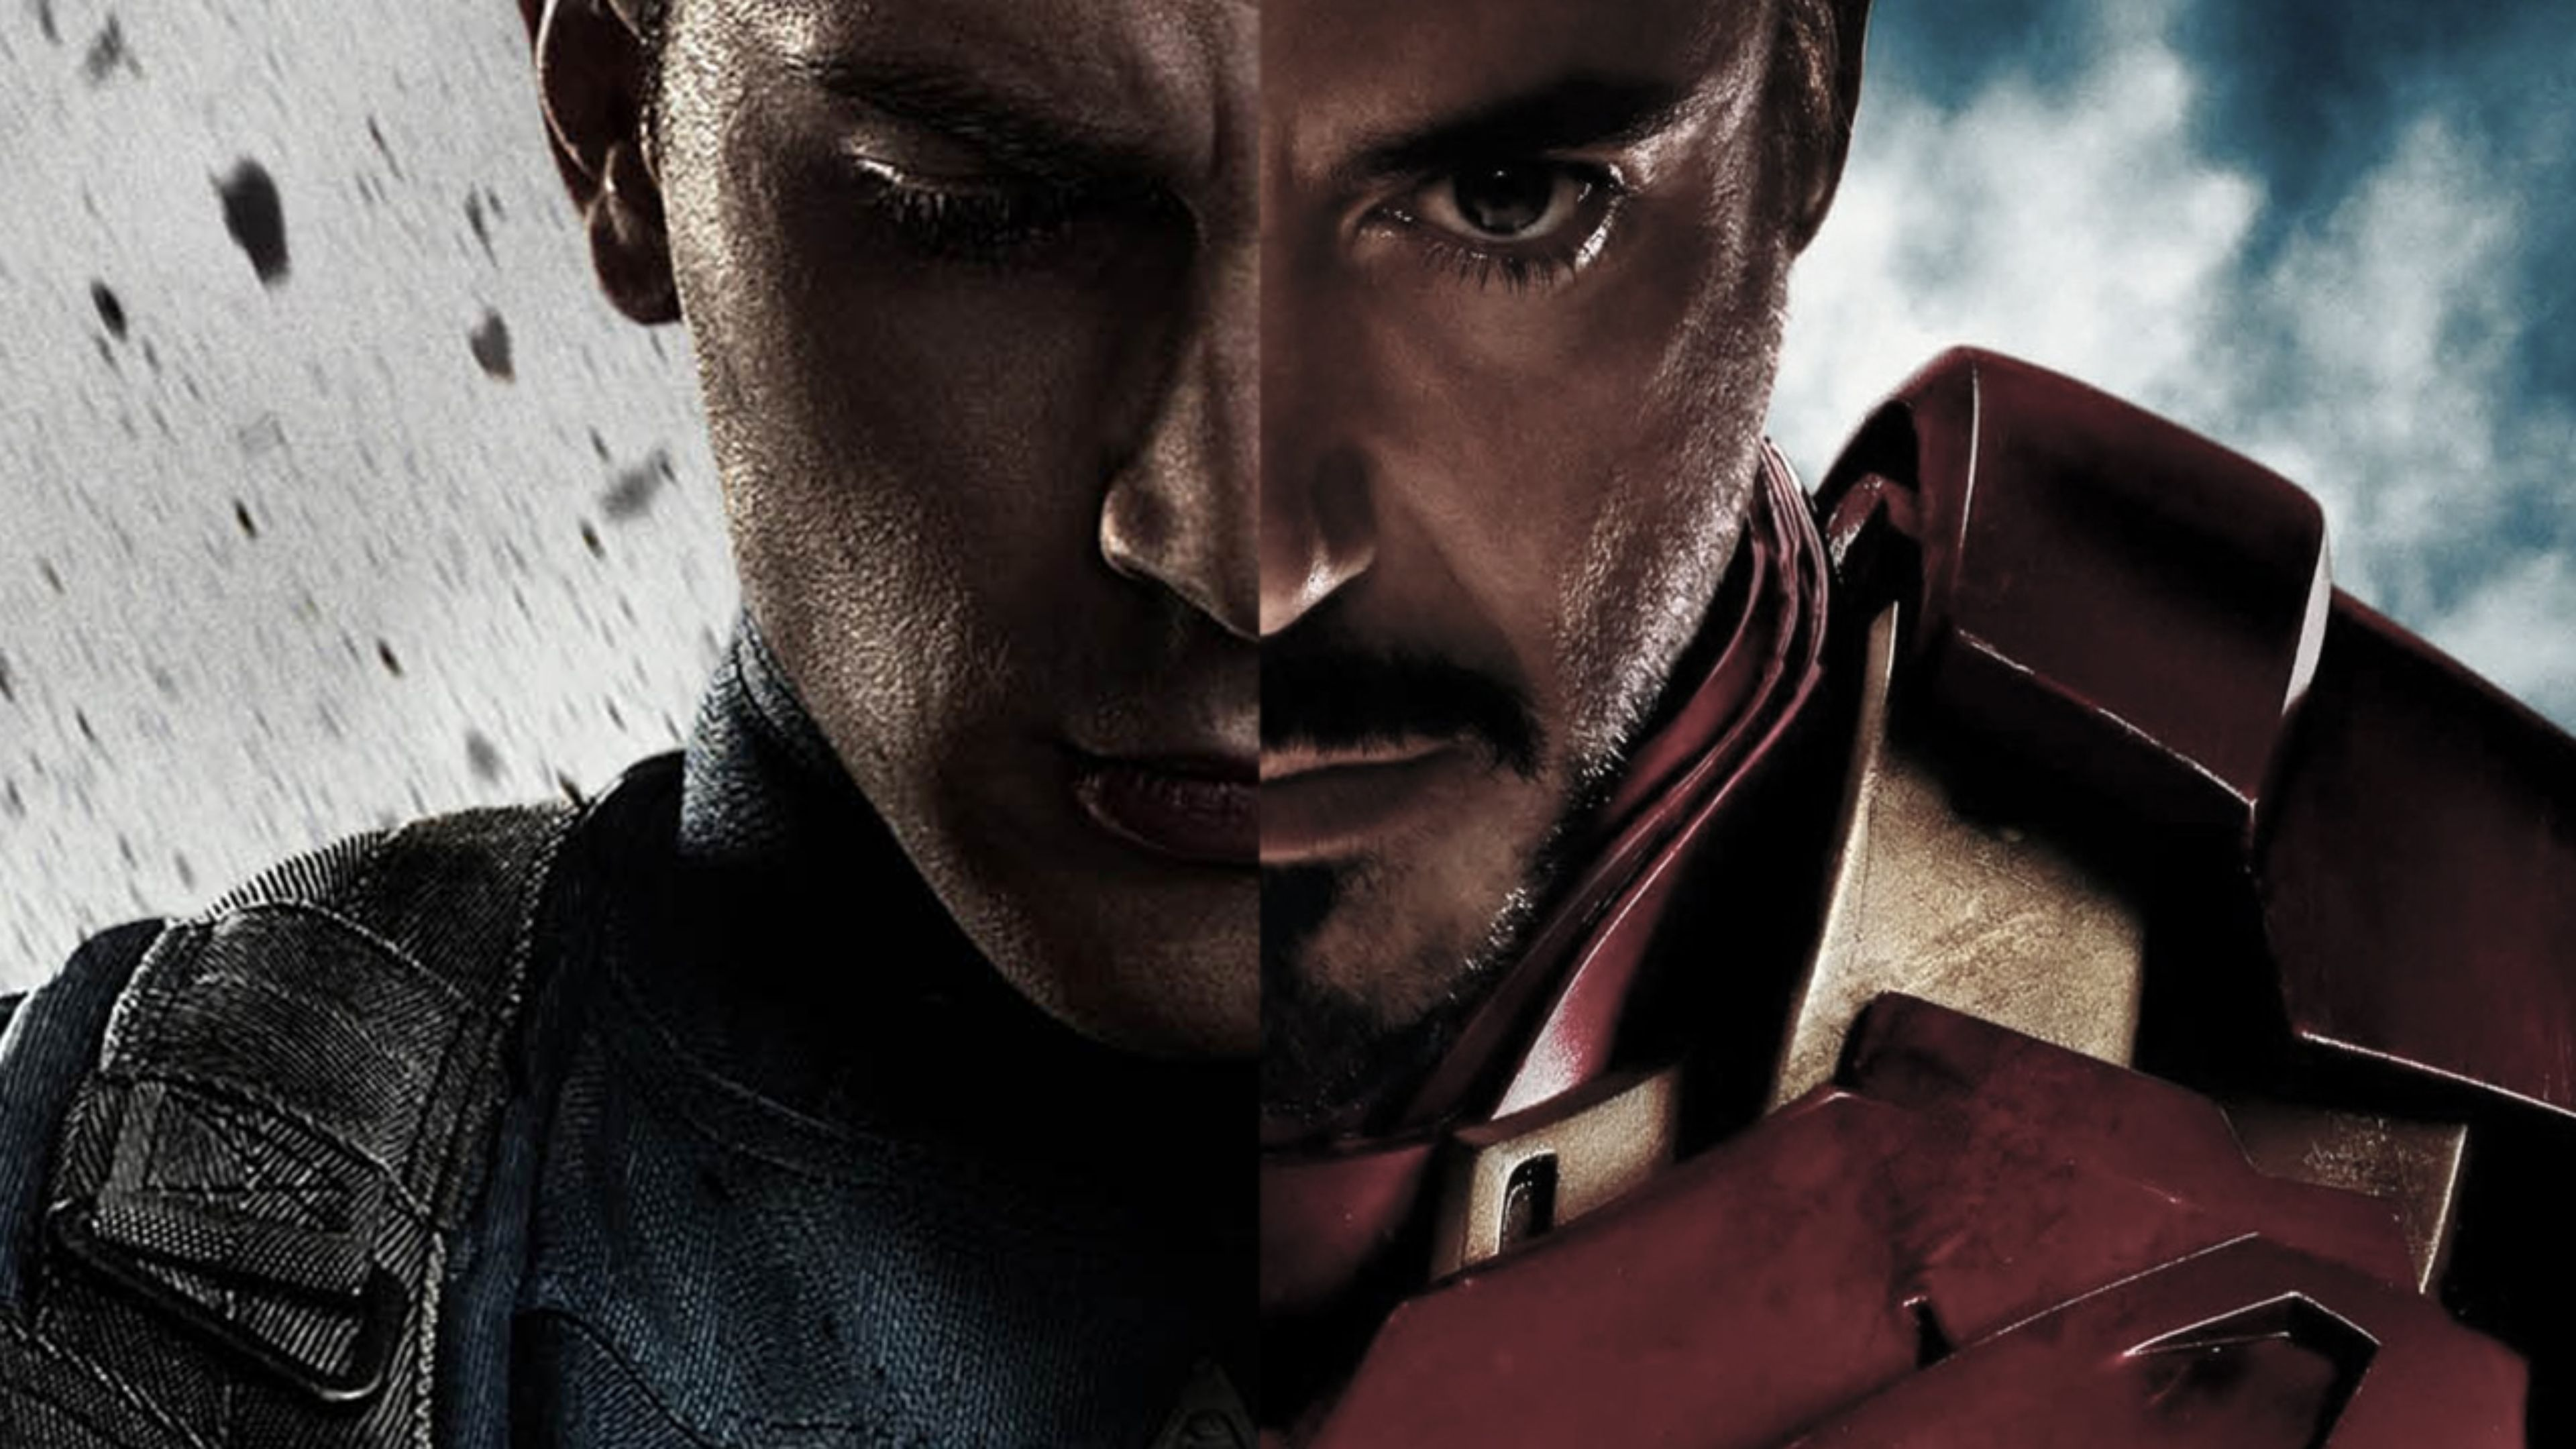 Reveal Captain America Civil War 4K Wallpaper 4K Wallpaper 3840x2160